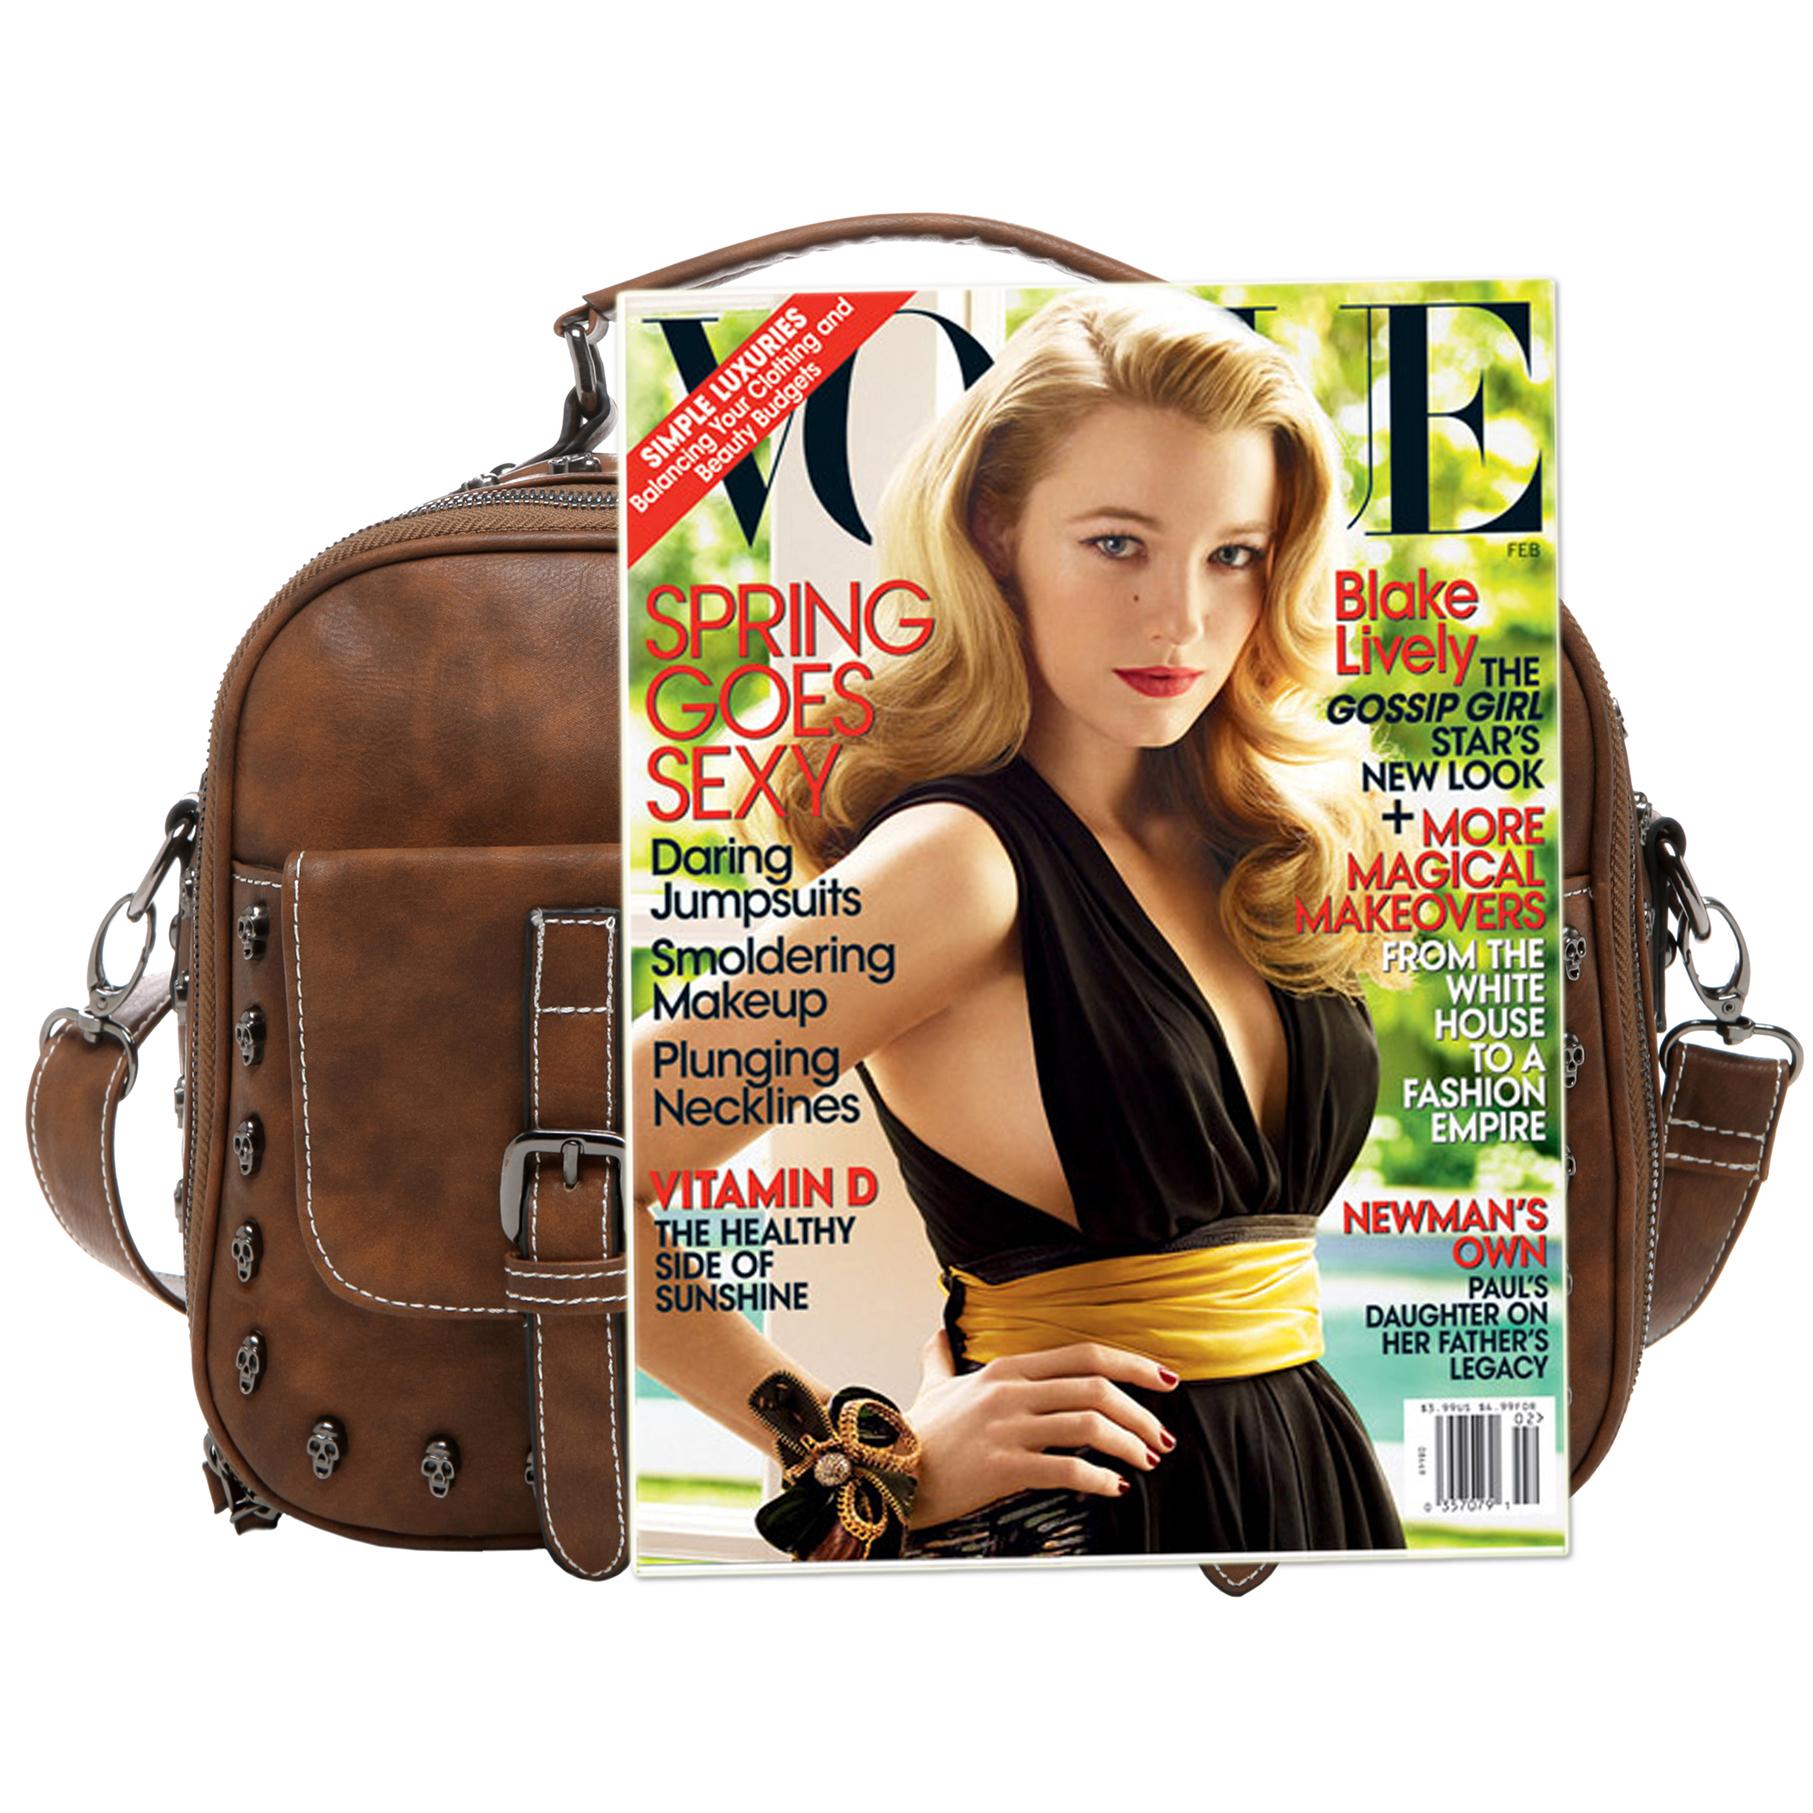 Women's Designer Handbag MASON in Brown Gothic Style Satchel size comparison image